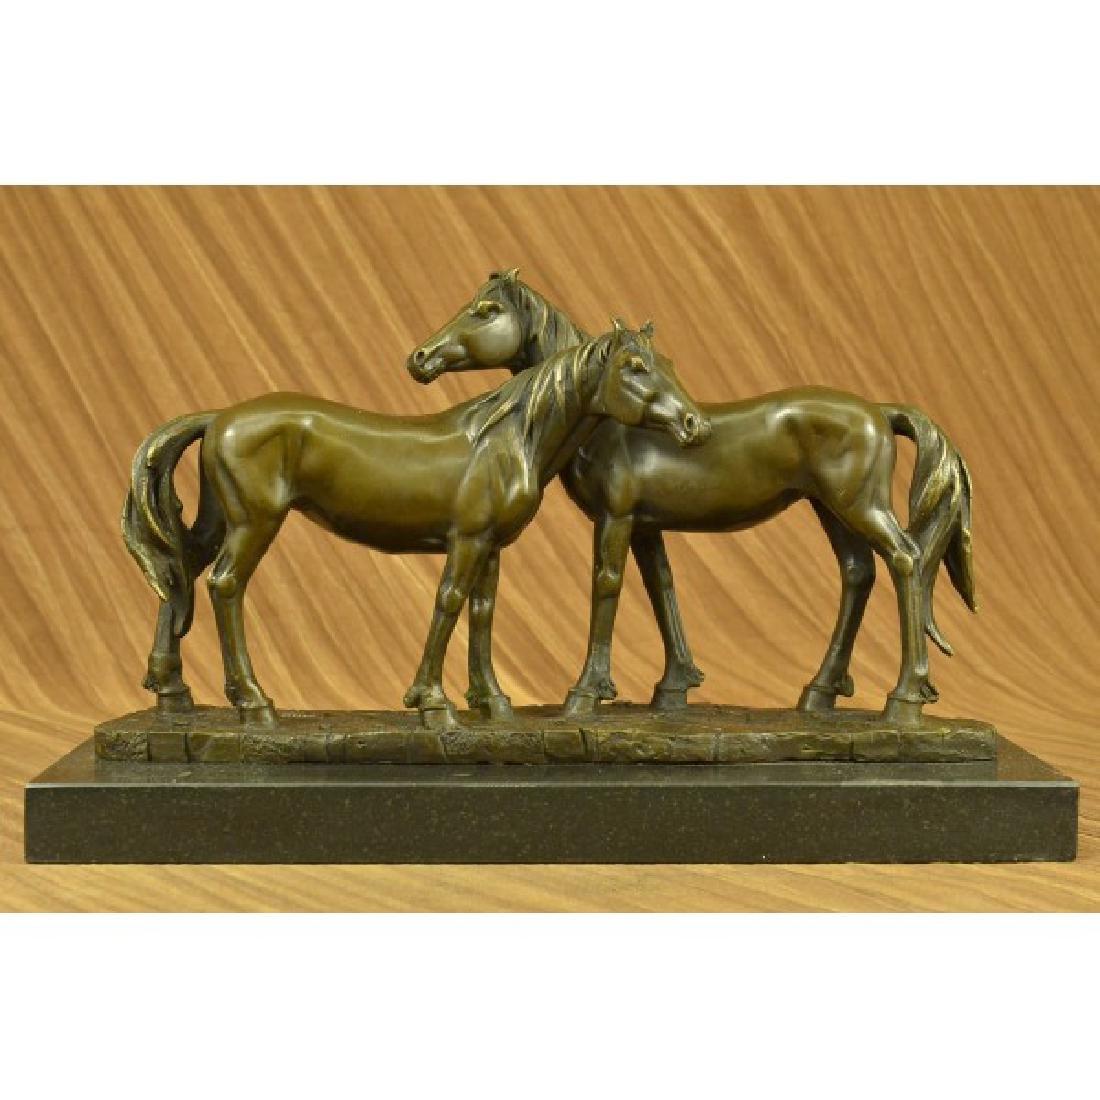 HORSES IN LOVE BRONZE SCULPTURE MARBLE BASE FIGURINE